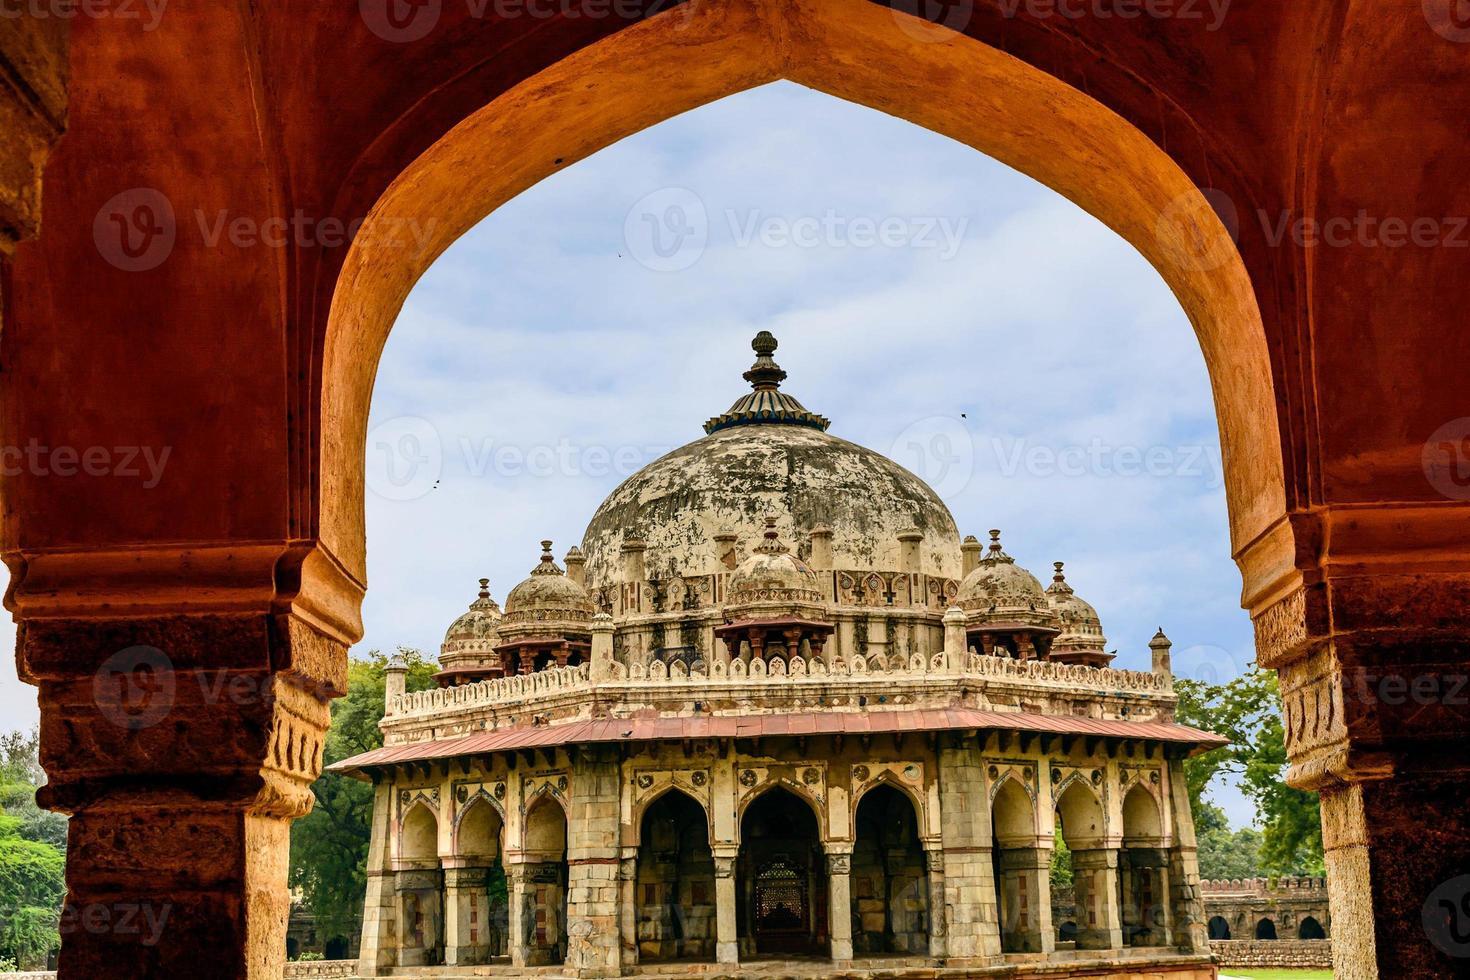 isa khan niyazi Grab, Humayan Komplex, Neu Delhi foto